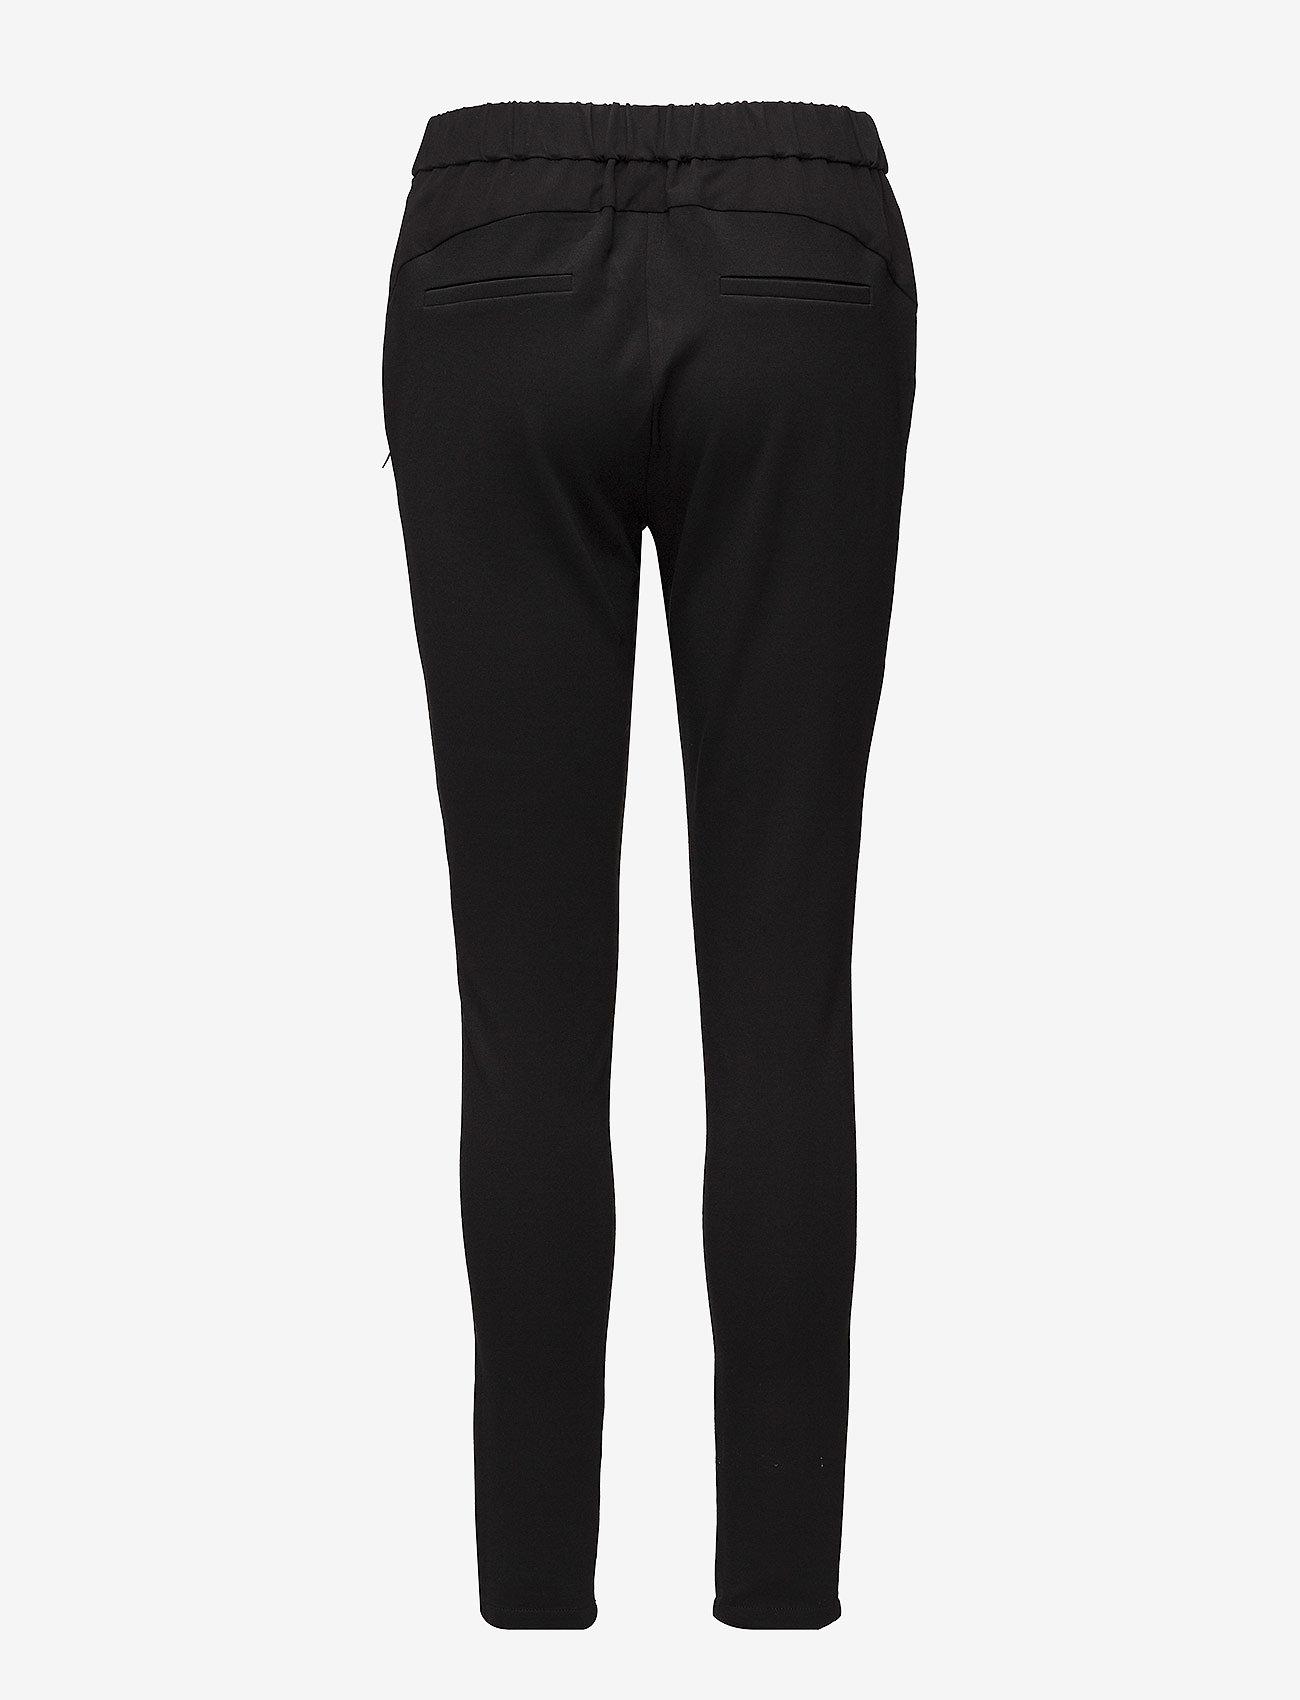 Coster Copenhagen - Pants w. Jersey back - Luca - broeken med skinny fit - black - 1